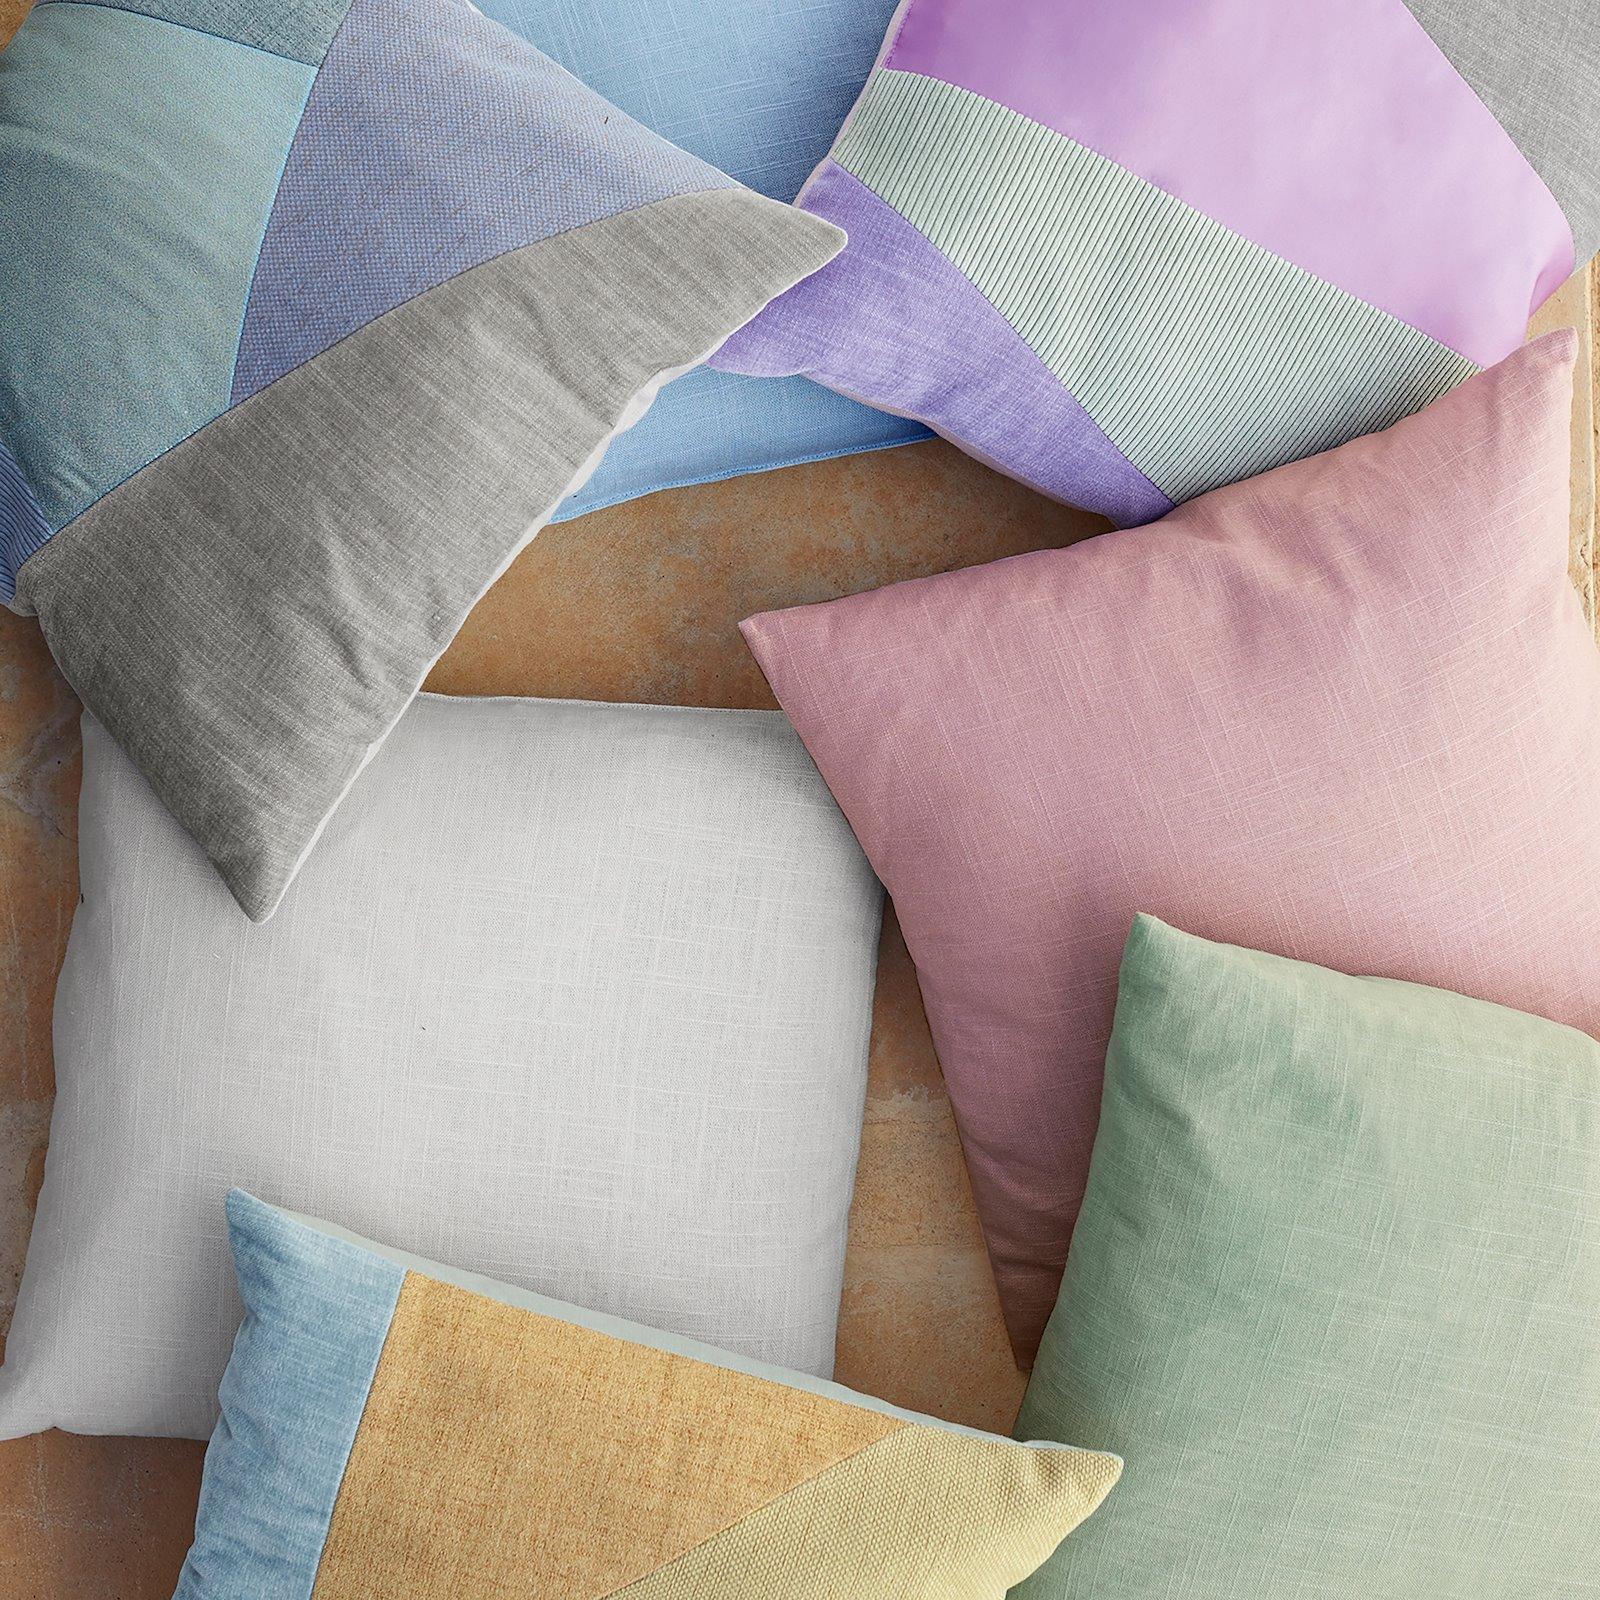 Upholstery fabric w/backing dusty aqua 824040_824048_824050_400321_824036_852309_824051_824040_620520_824035_bundle